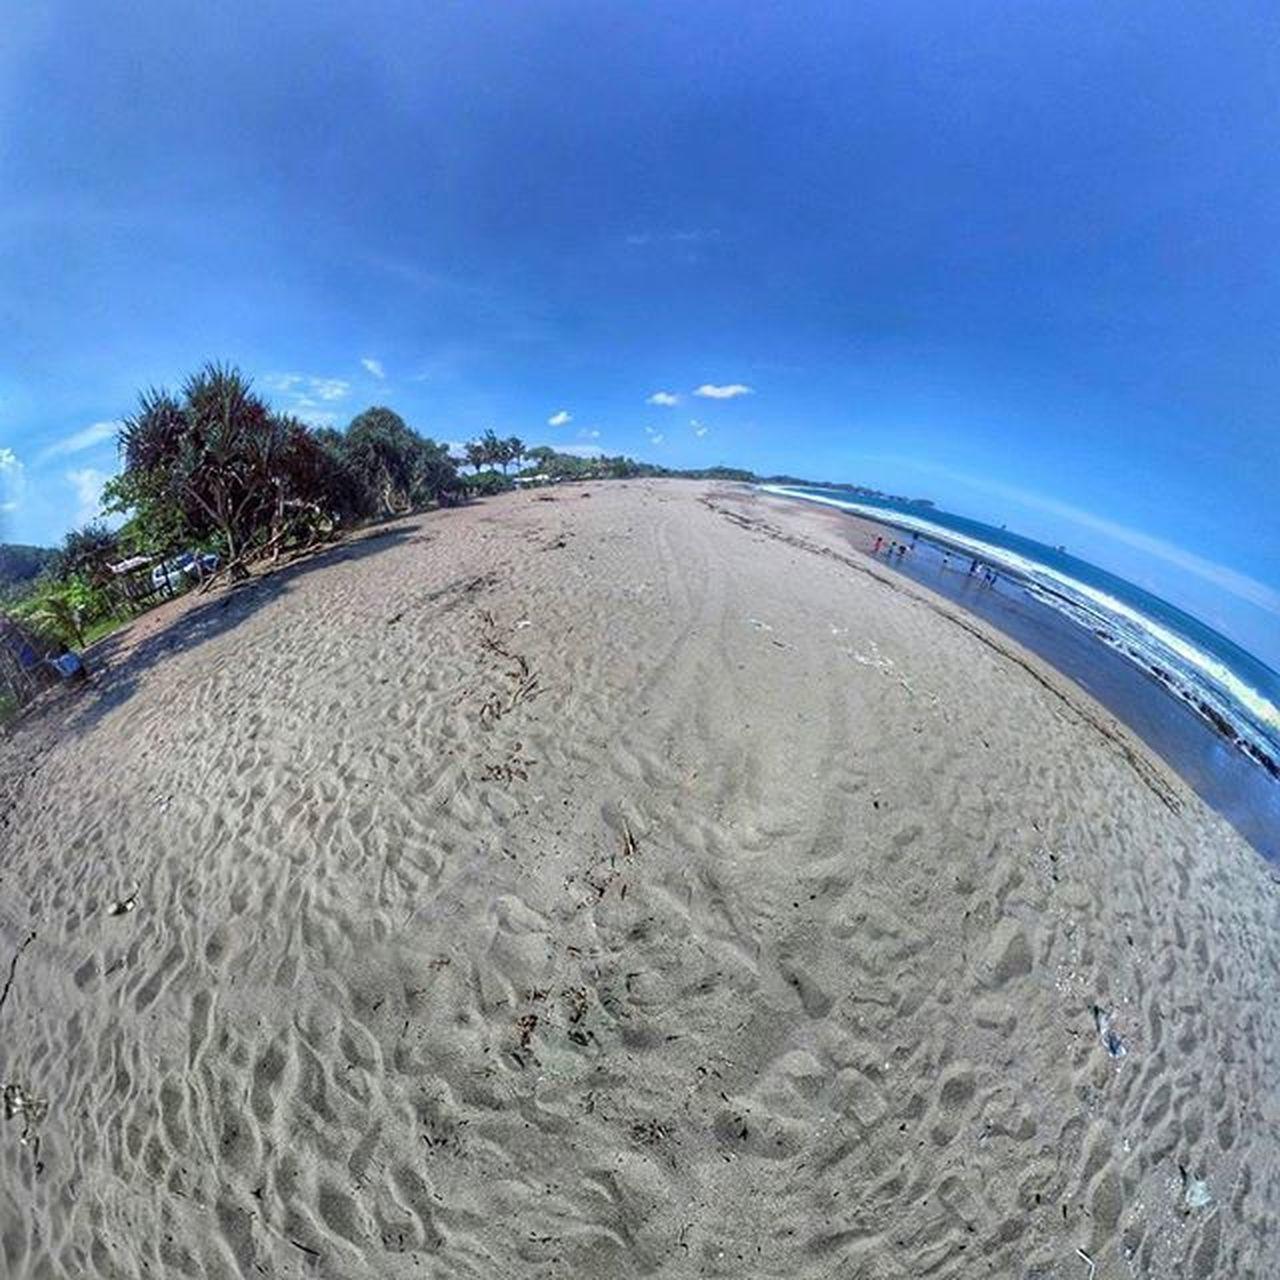 Mata indah bola pingpong. . . . Photosphere Panorama Googlecamera Malang Malangkipa Ngalam Ricohtheta Tinyplanet Tinyplanets Redmi2camera Xiaomi